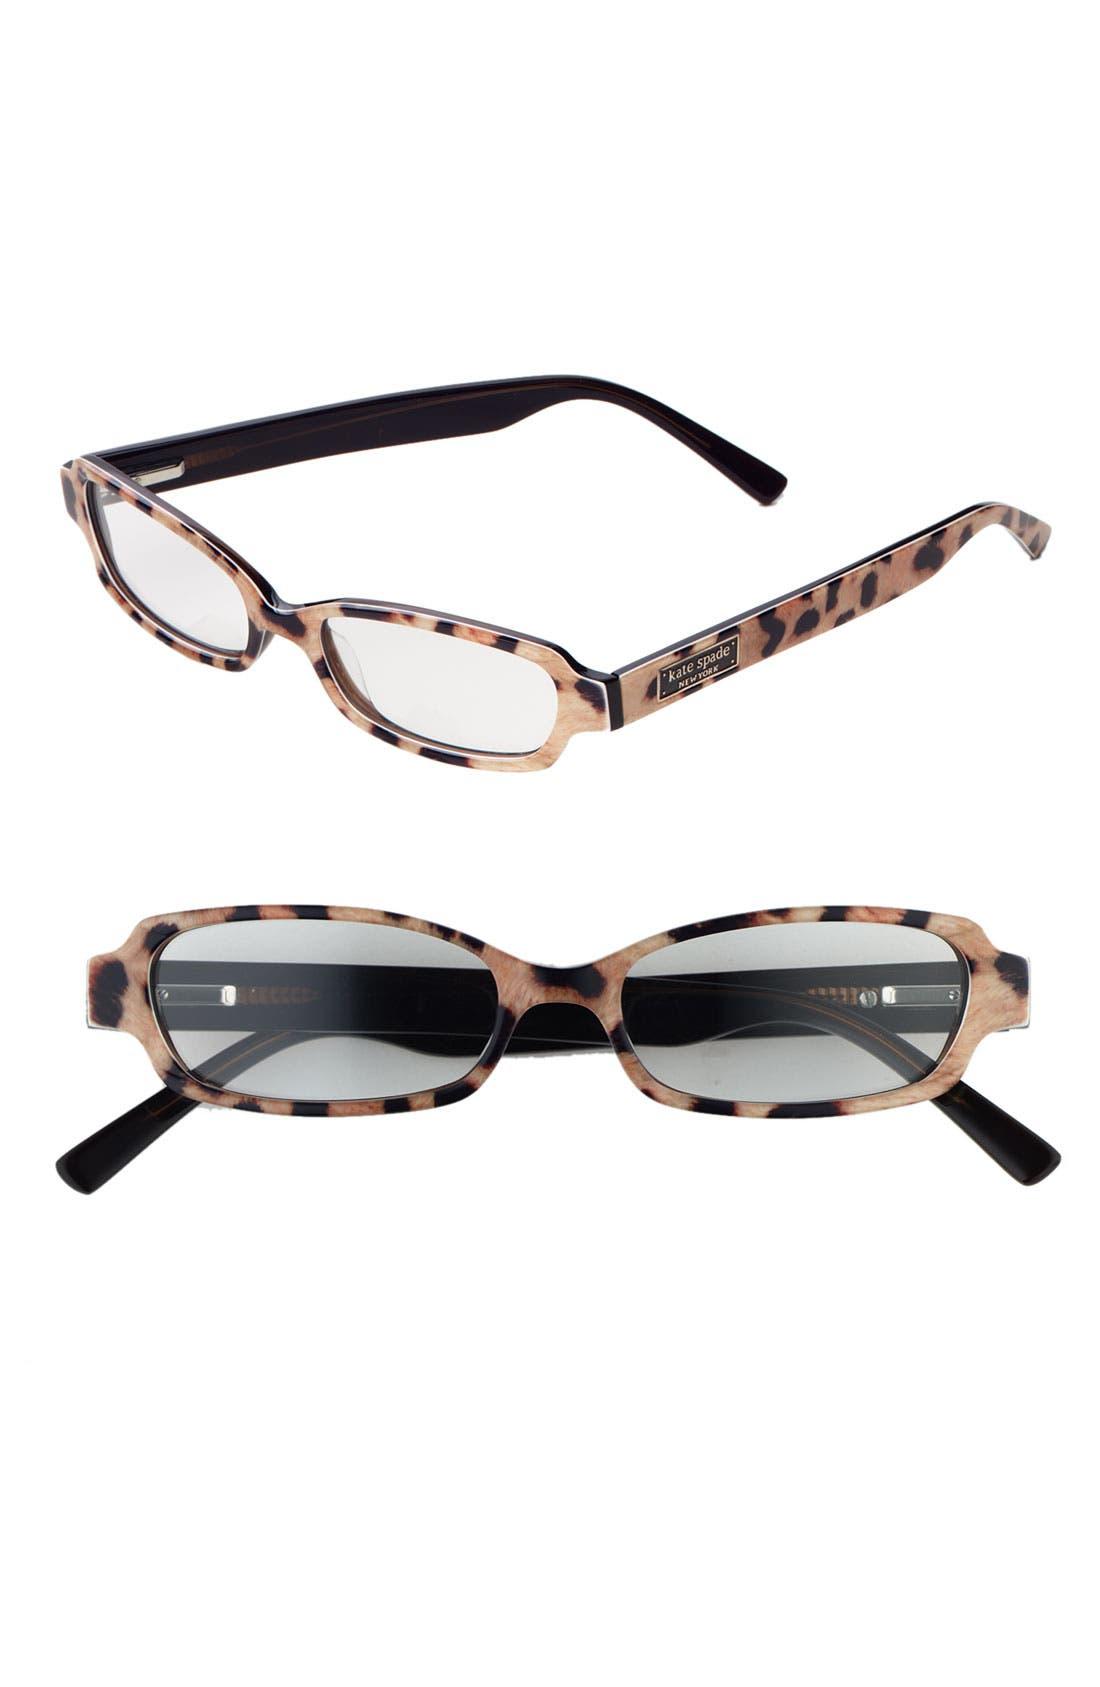 Main Image - kate spade new york 'millie' reading glasses